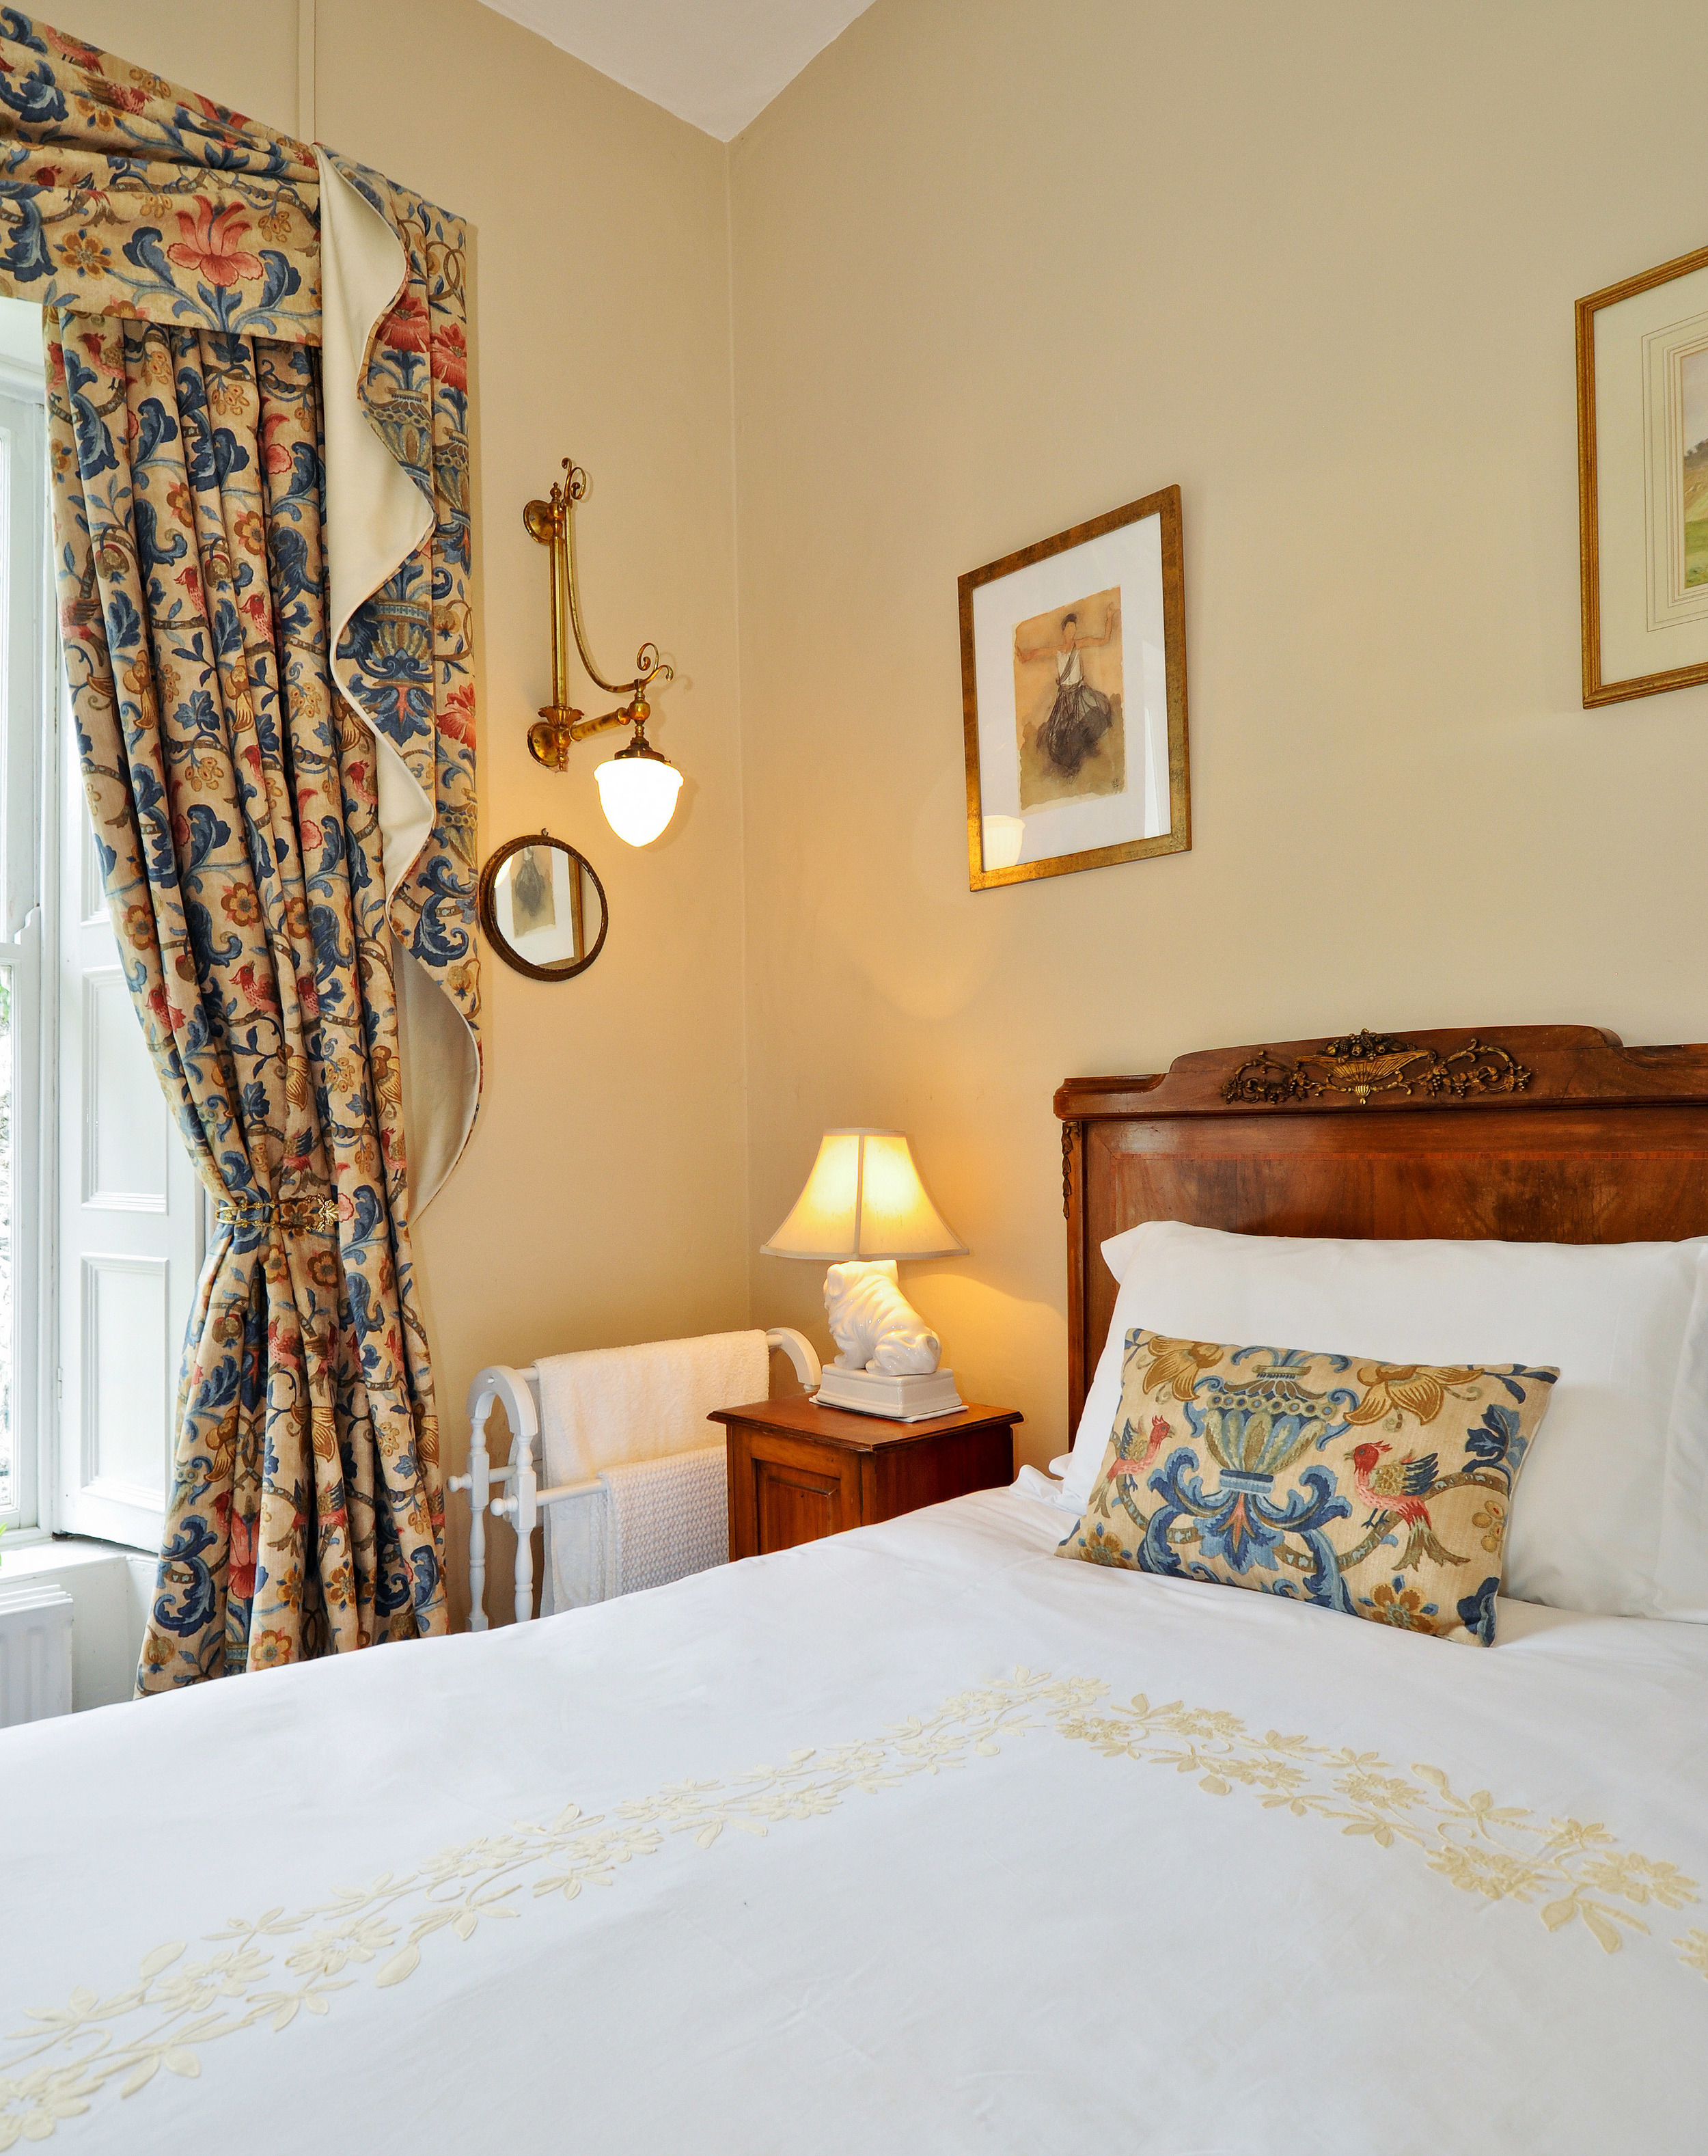 Luxury accommodation in historic house Ireland